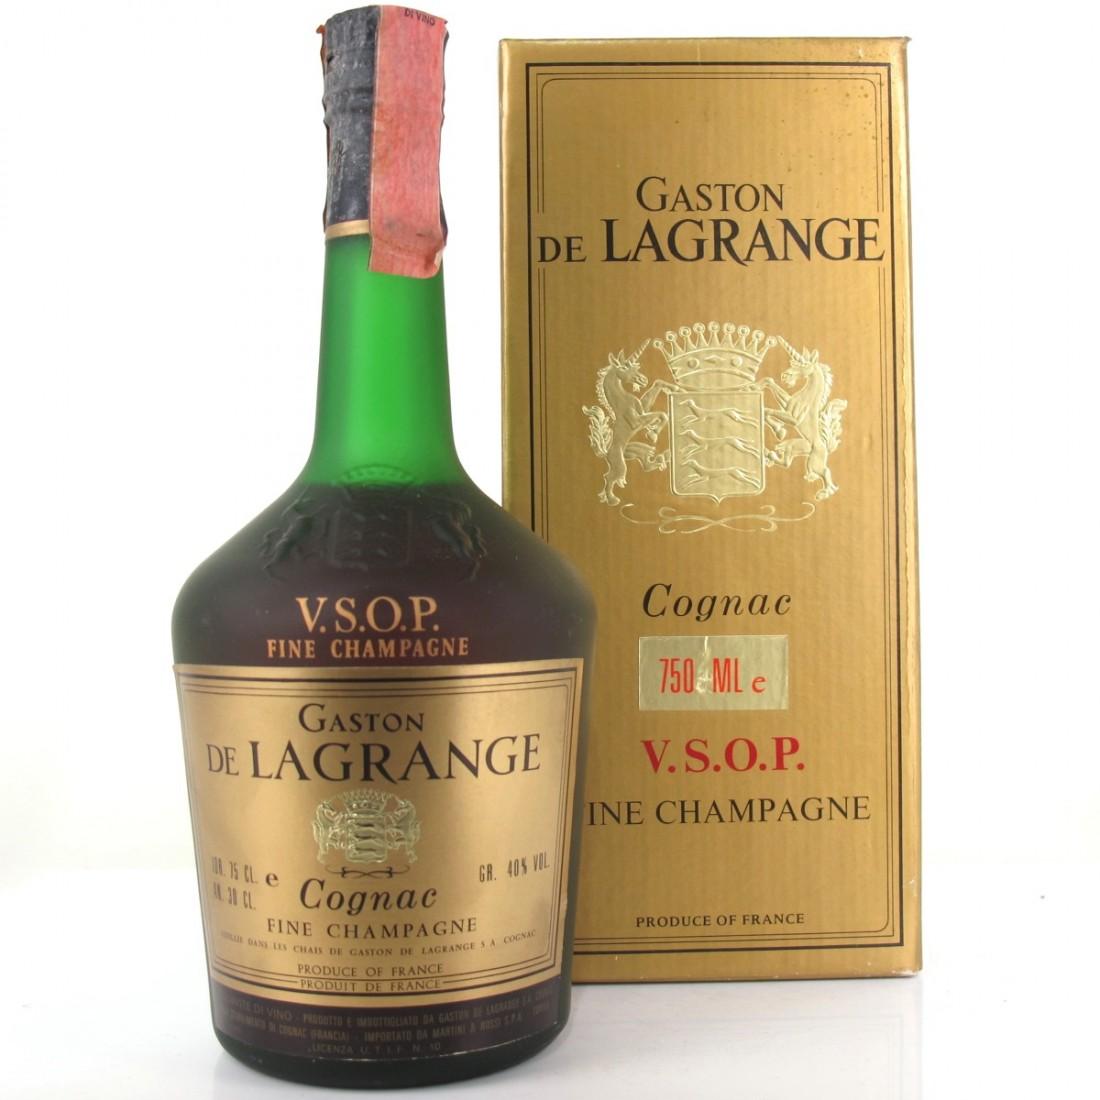 Gaston de Lagrange VSOP Cognac 1980s